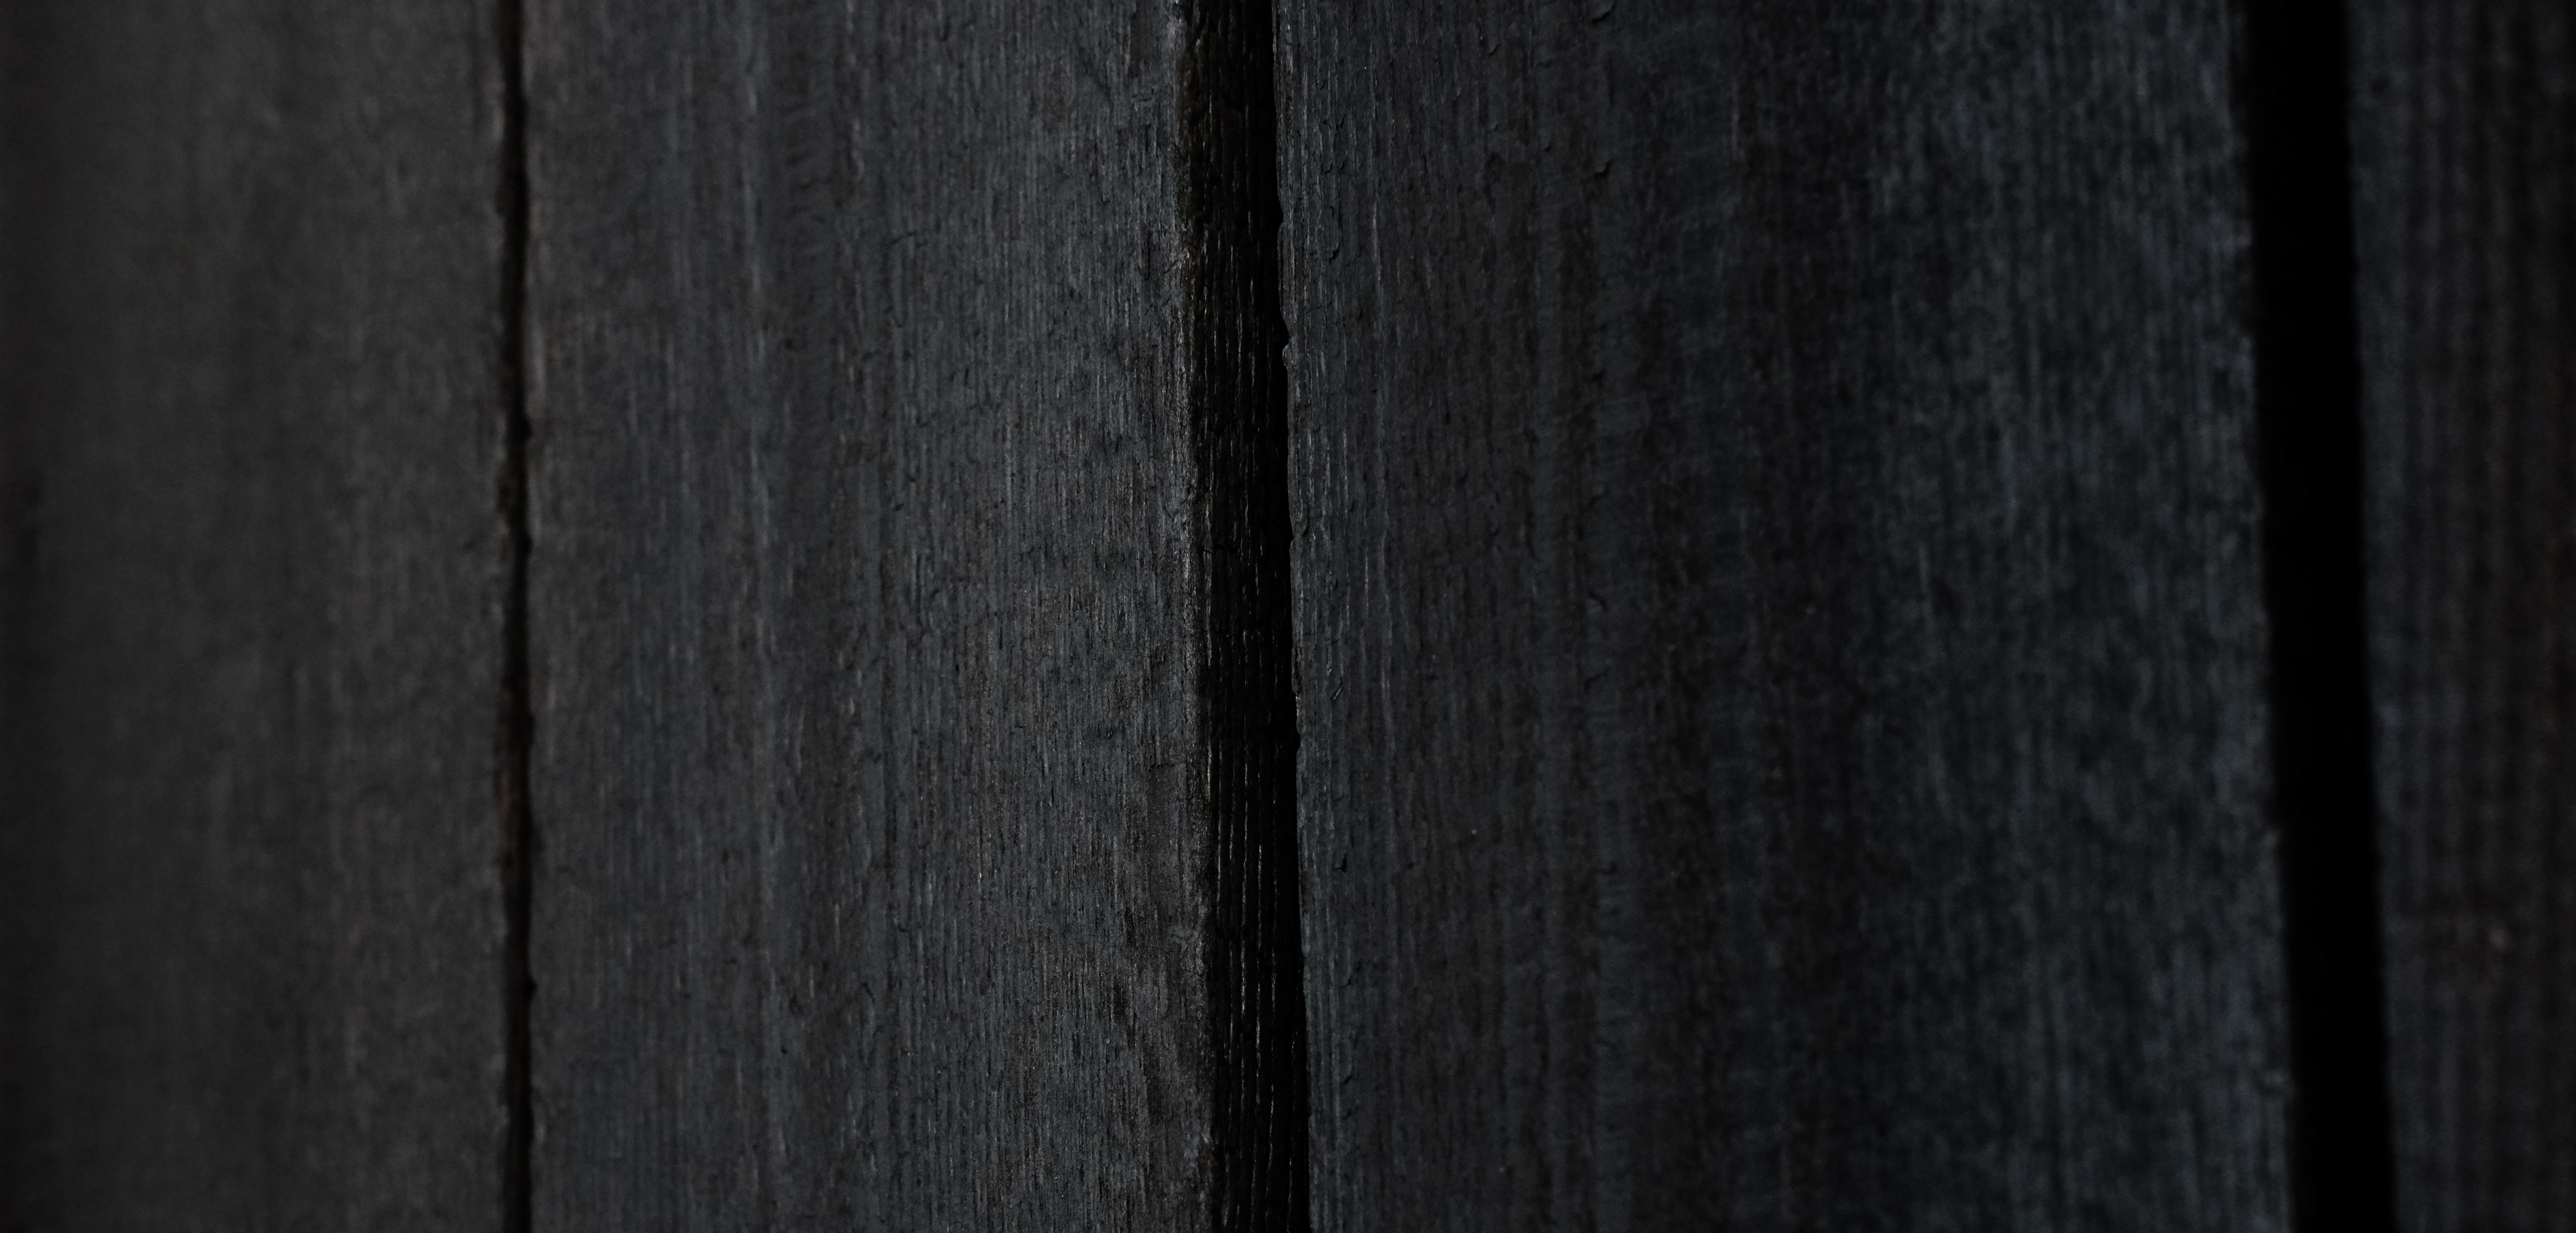 rauchholz verkohltes holz schwarze fassaden